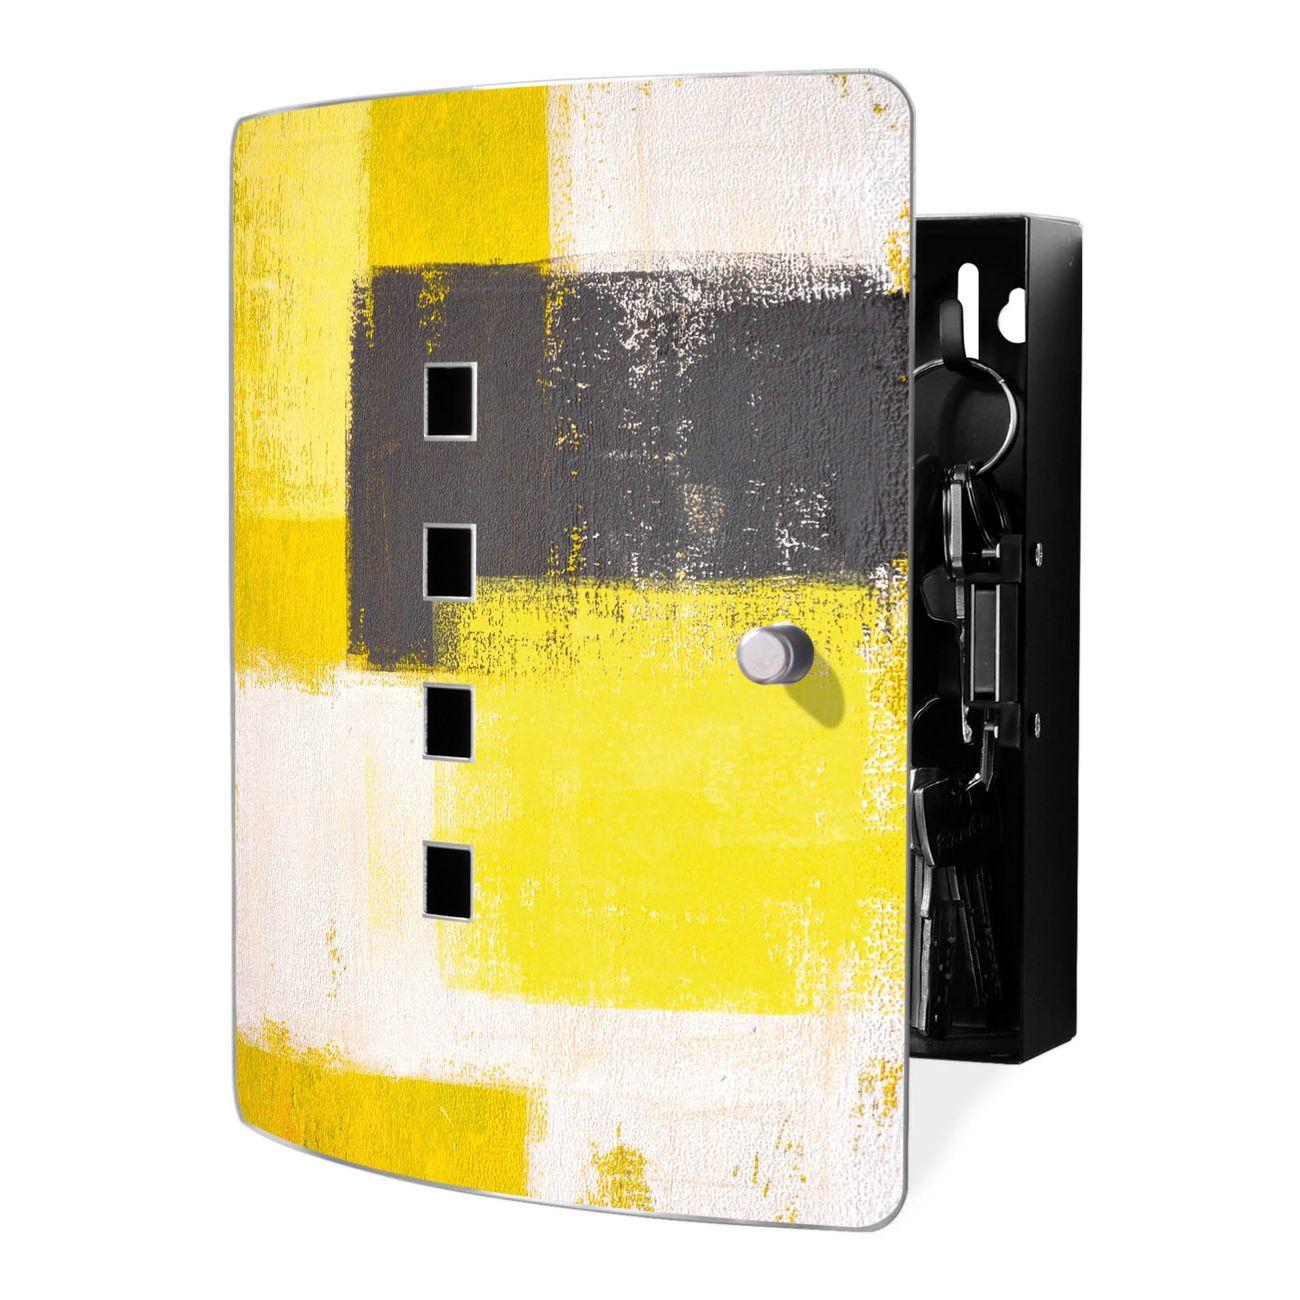 Schlüsselkasten Motiv Abstrakt Gelb